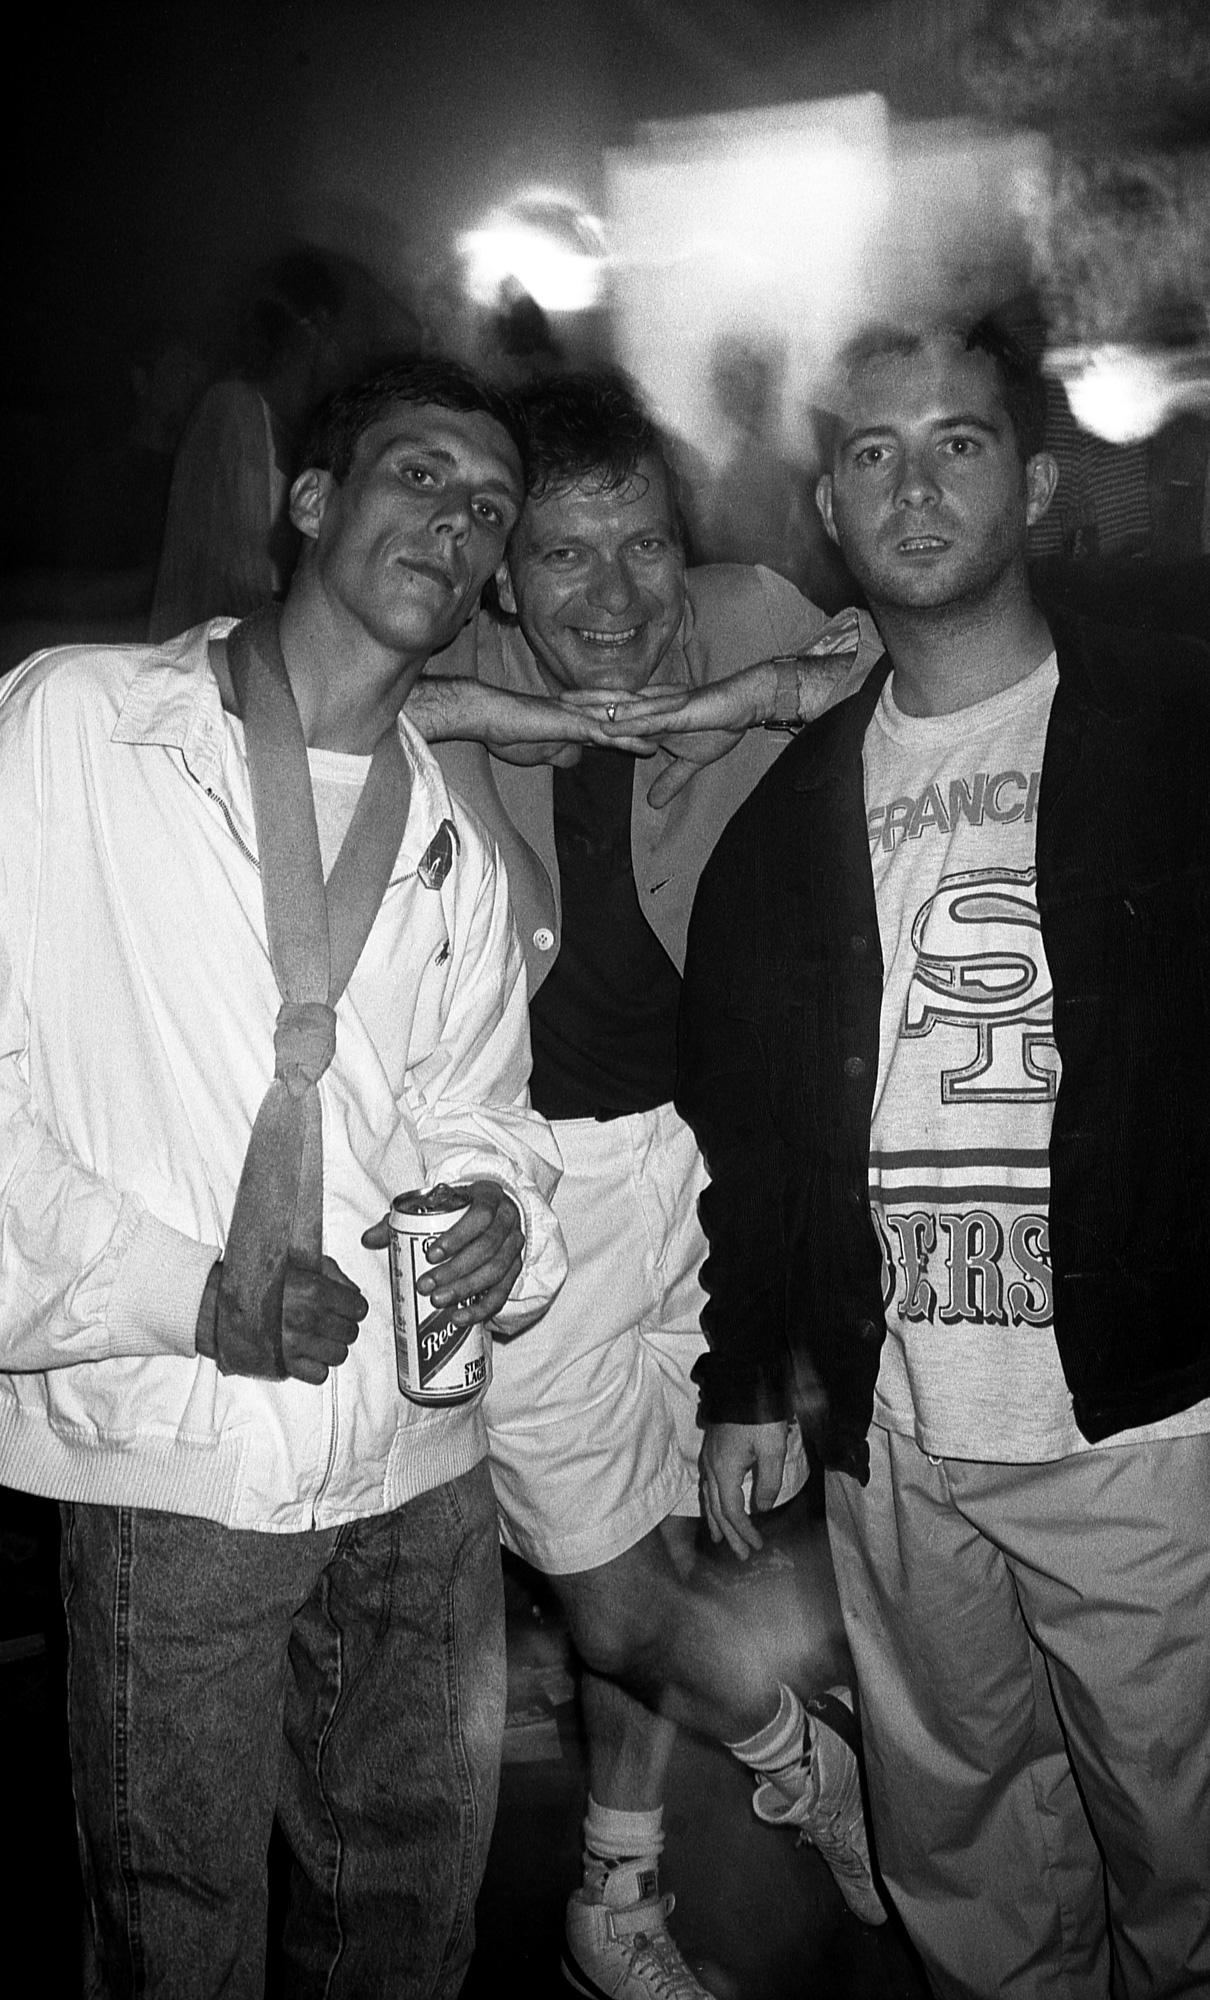 Peter J Walsh - Rave One - Bez [Happy Mondays], Tony Wilson and P.D. [Happy Mondays].jpg